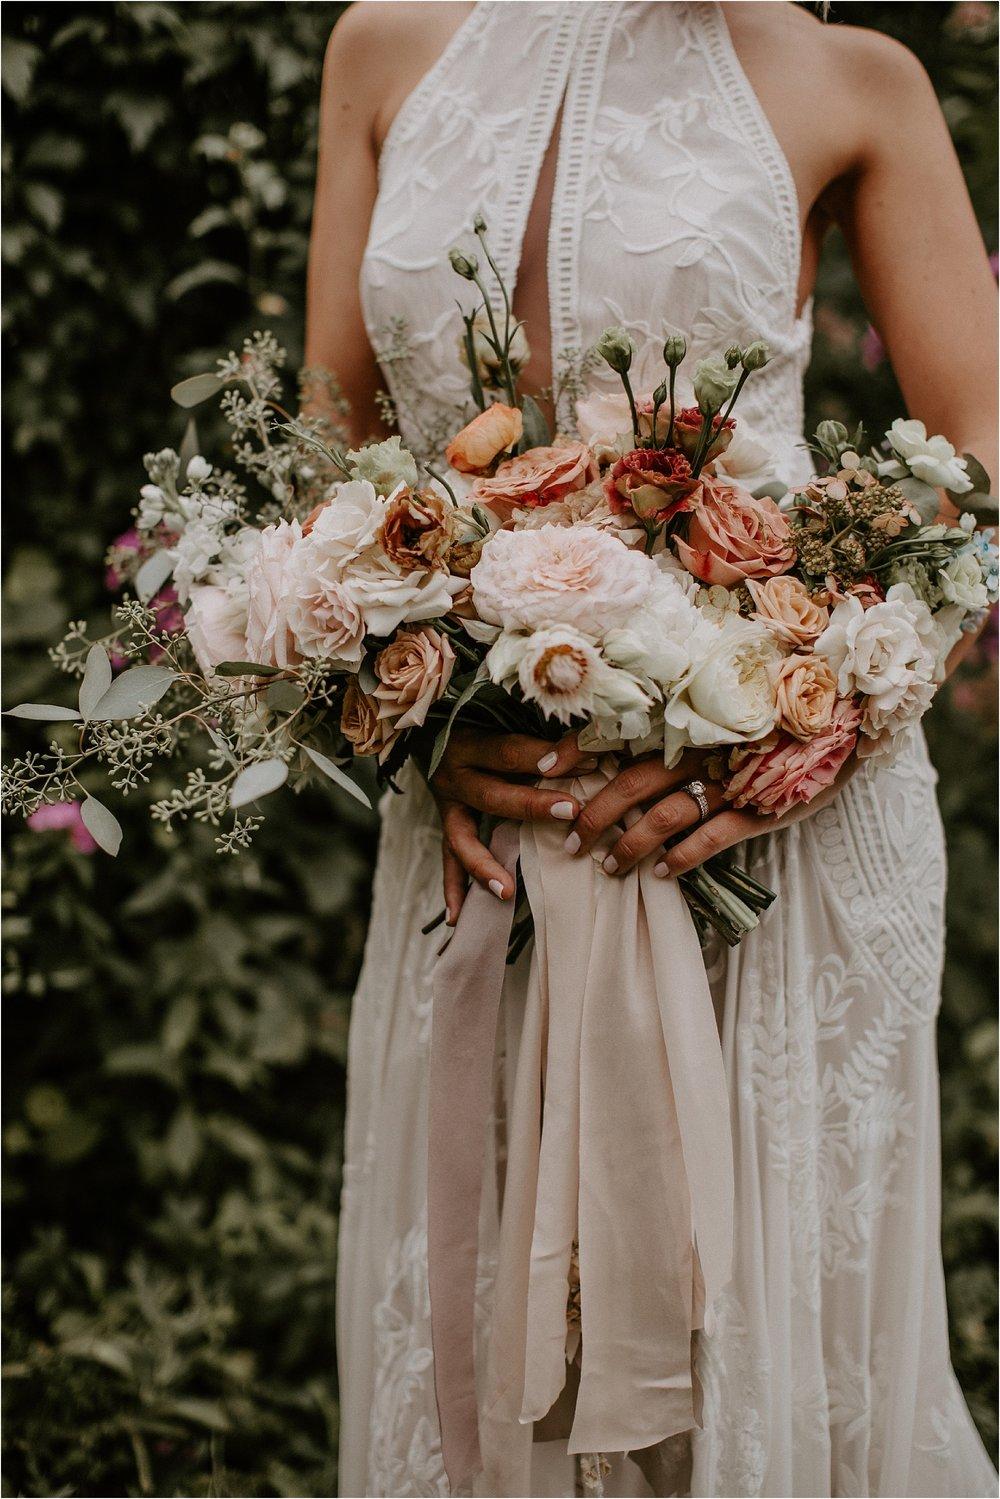 Sarah_Brookhart_Hortulus_Farm_Garden_and_Nursey_Wedding_Photographer_0017.jpg